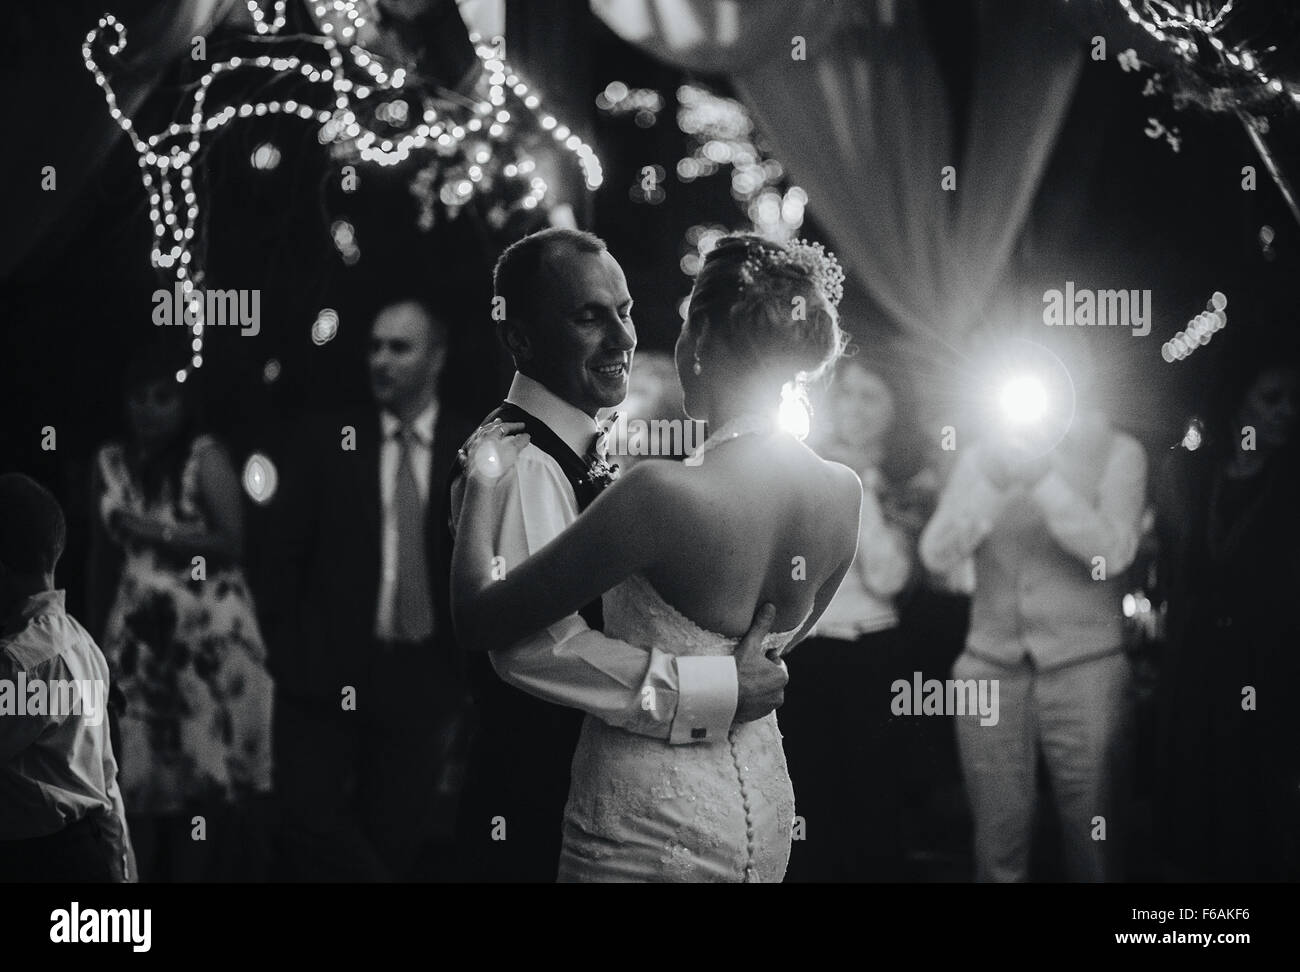 Danza de la boda hermosa pareja Imagen De Stock